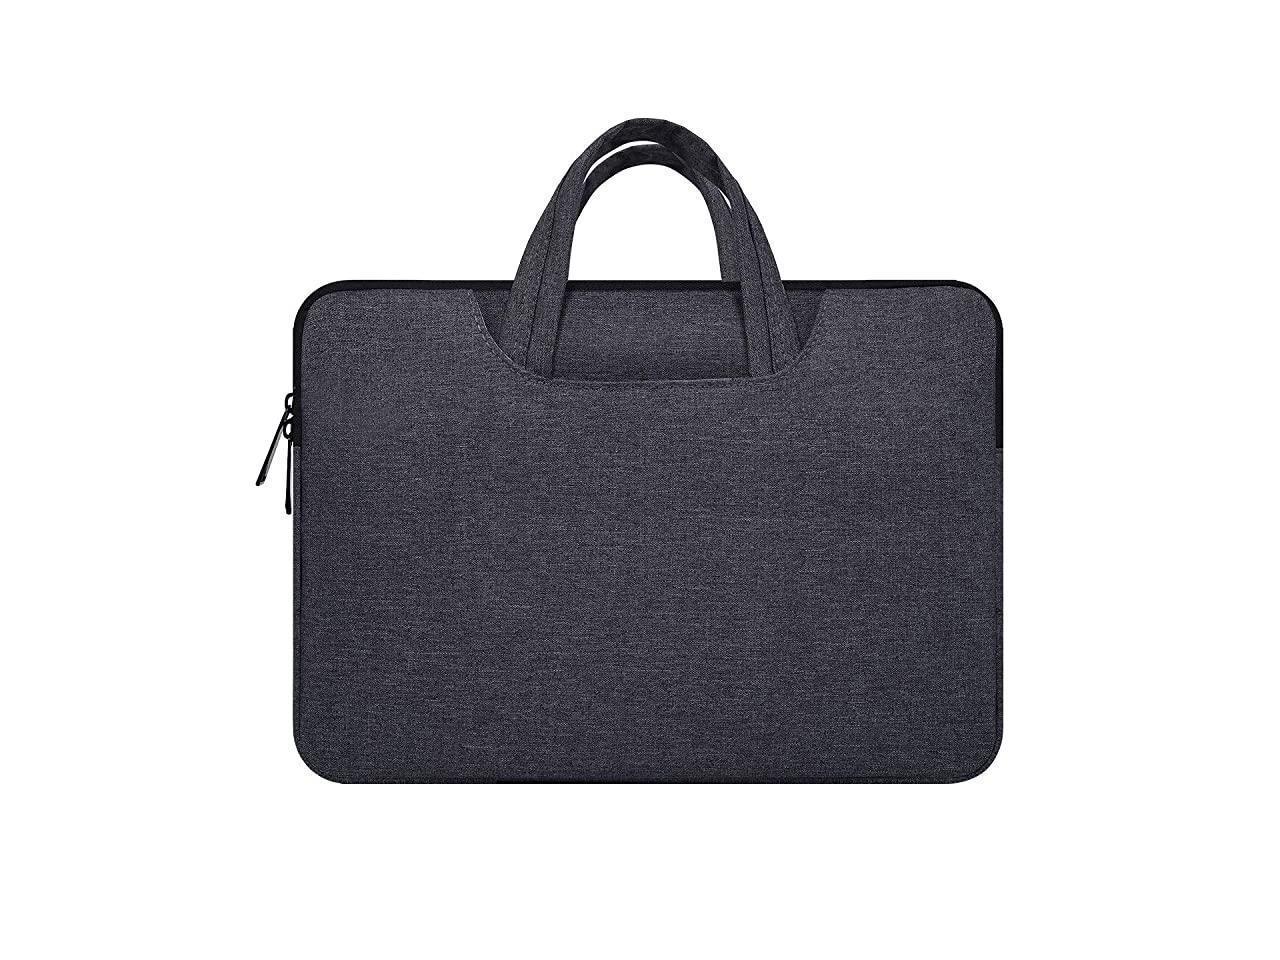 15.6 Inch Laptop Bag,Laptop Sleeve Case for HP Pavillion//HP Premium//HP Envy x360 15.6,Lenovo Ideapad 330,Lenovo Yoga 720//730 15.6,Acer Aspire 5//Acer Aspire E 15 with Handle Sleeve Bag Space Grey